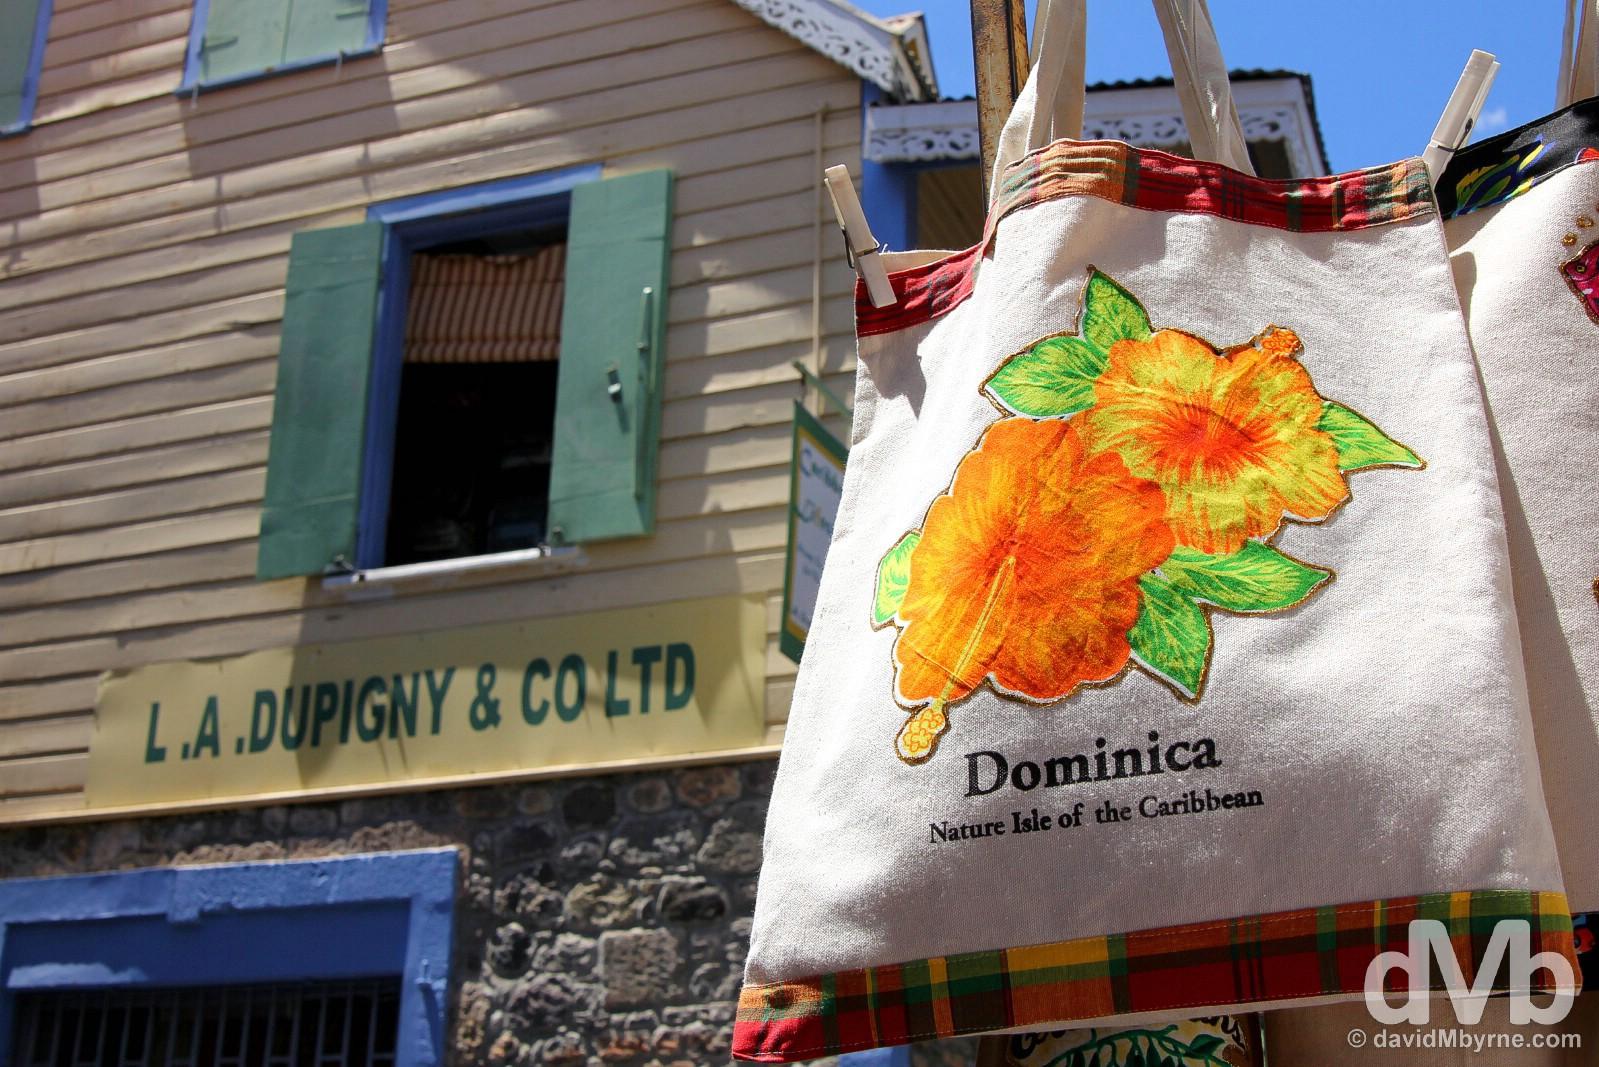 Old Market, Roseau, Dominica, Lesser Antilles. June 10, 2015.